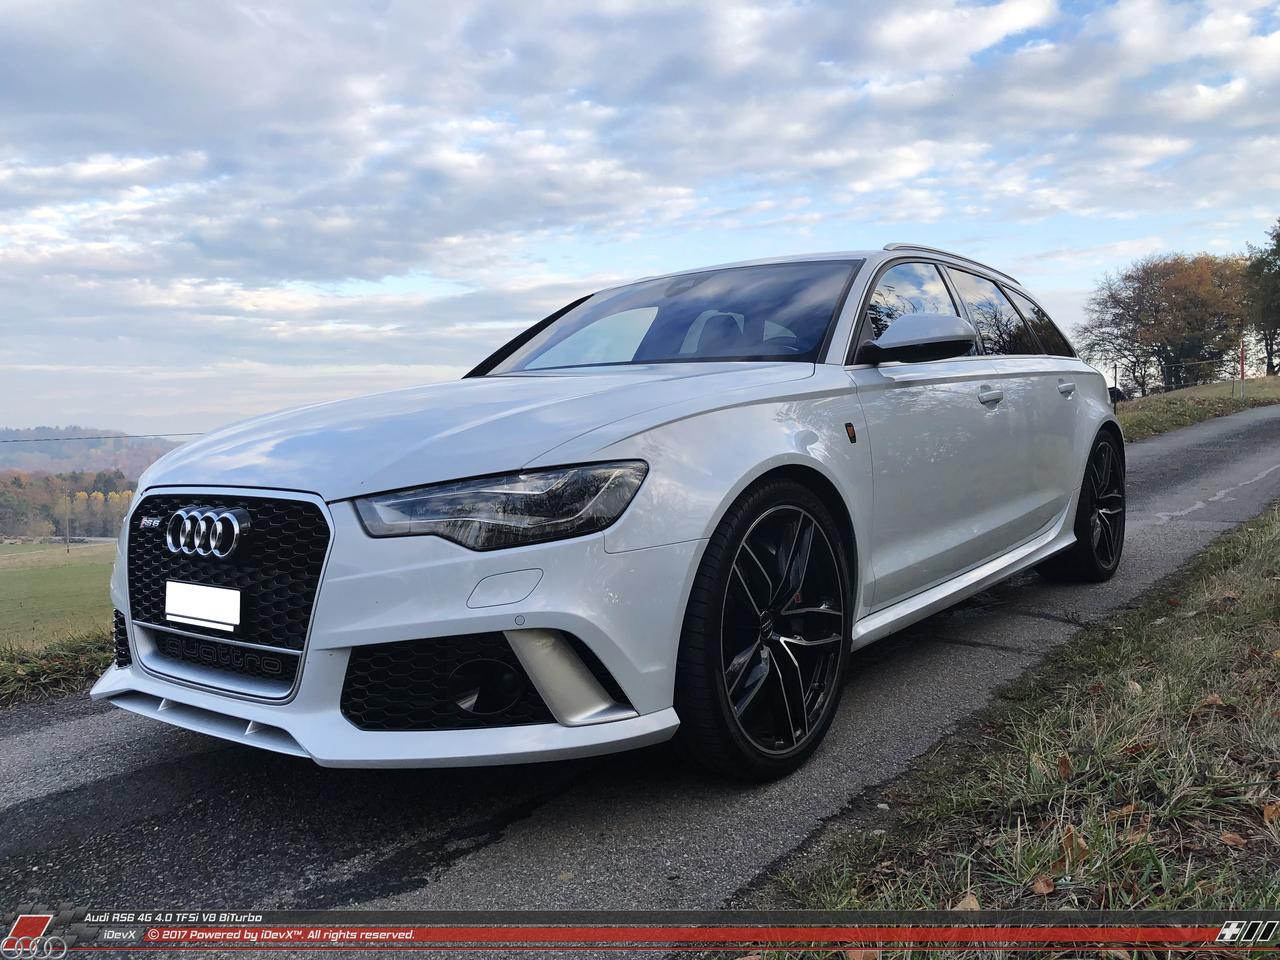 09_11.2018_Audi-RS6_iDevX_001.png